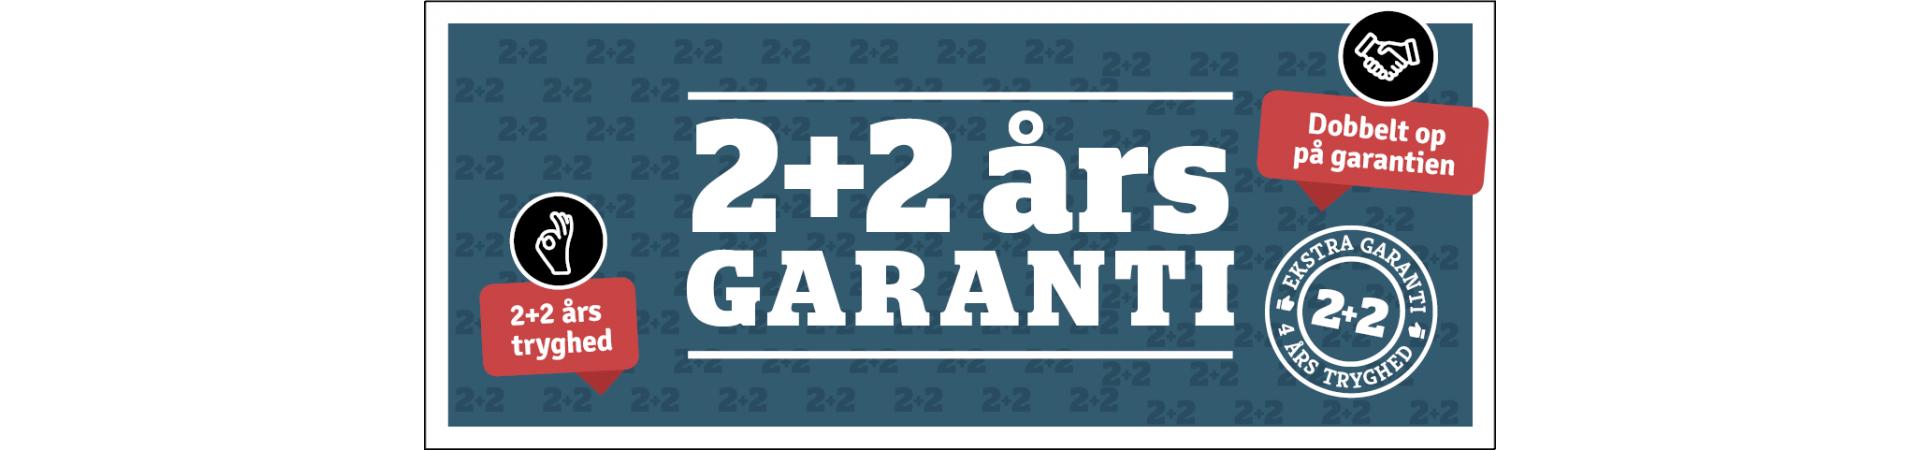 Dobbelt op på garantien